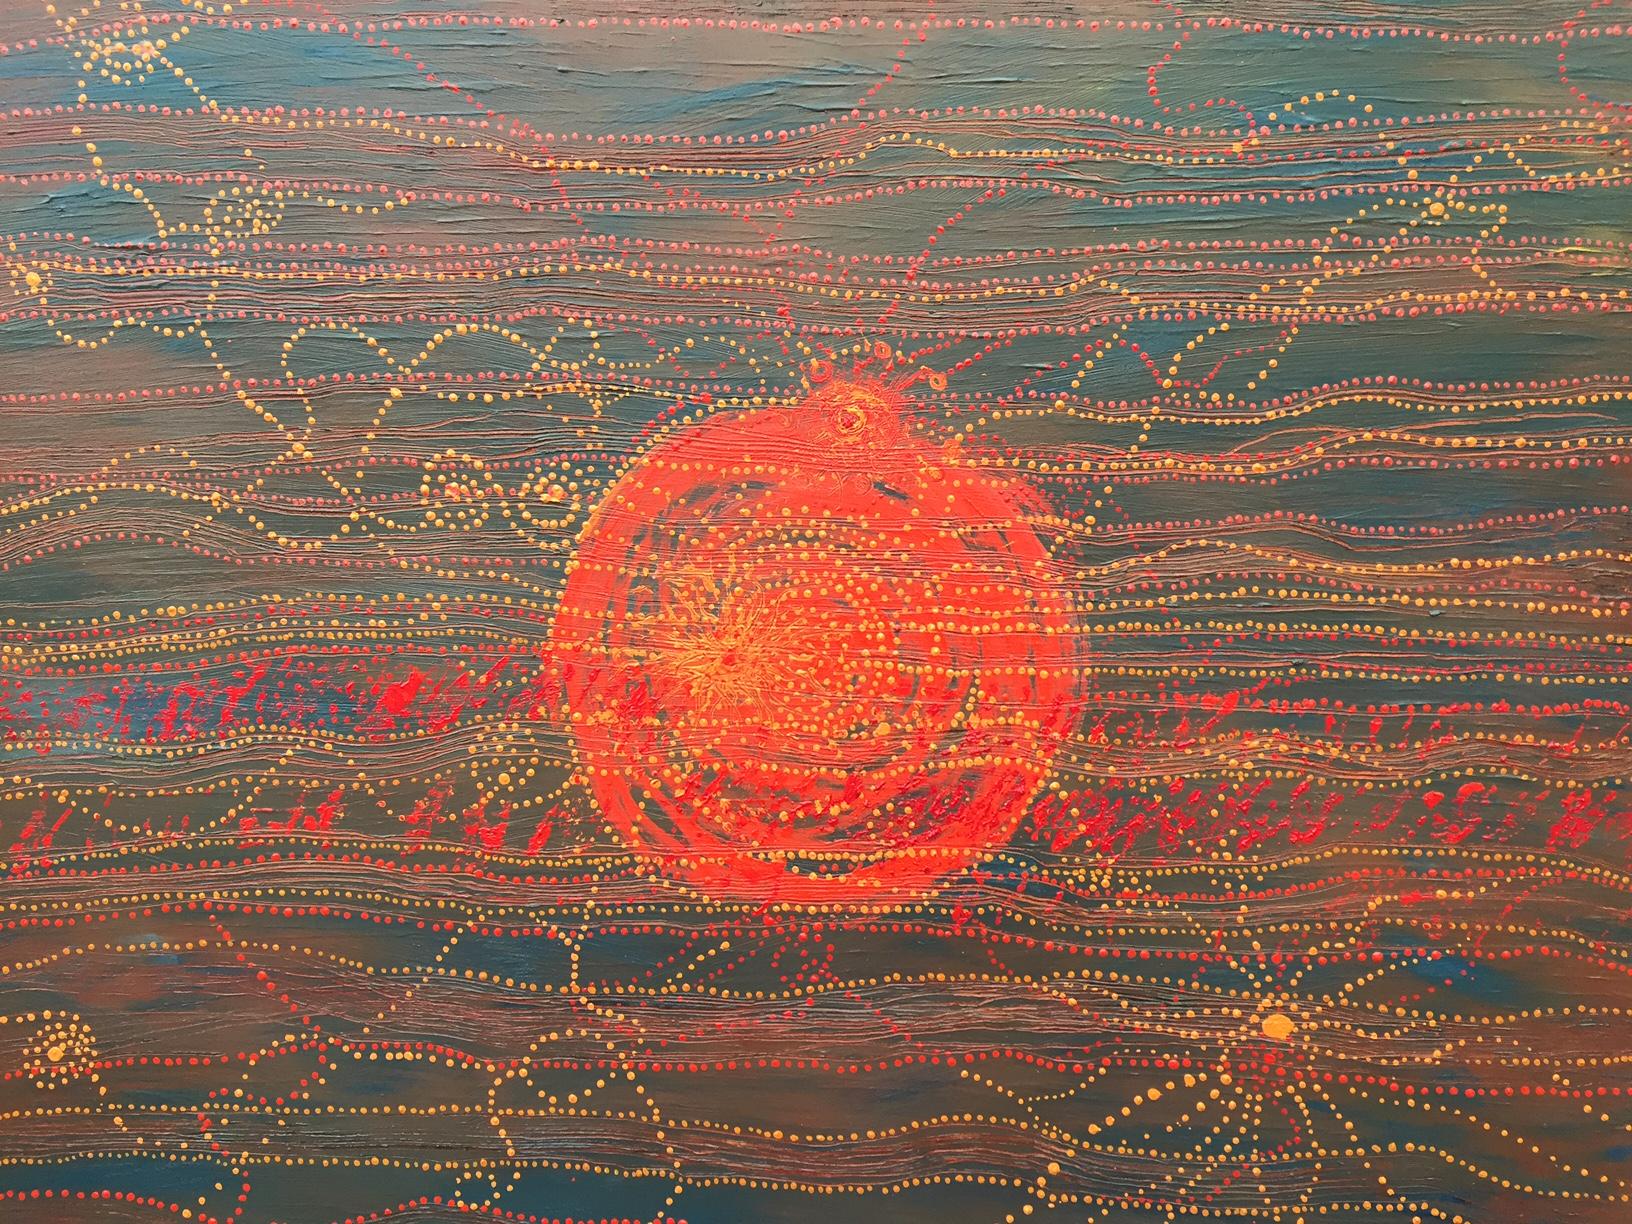 Creation - Oil & acrylic38 x 46 inches£750